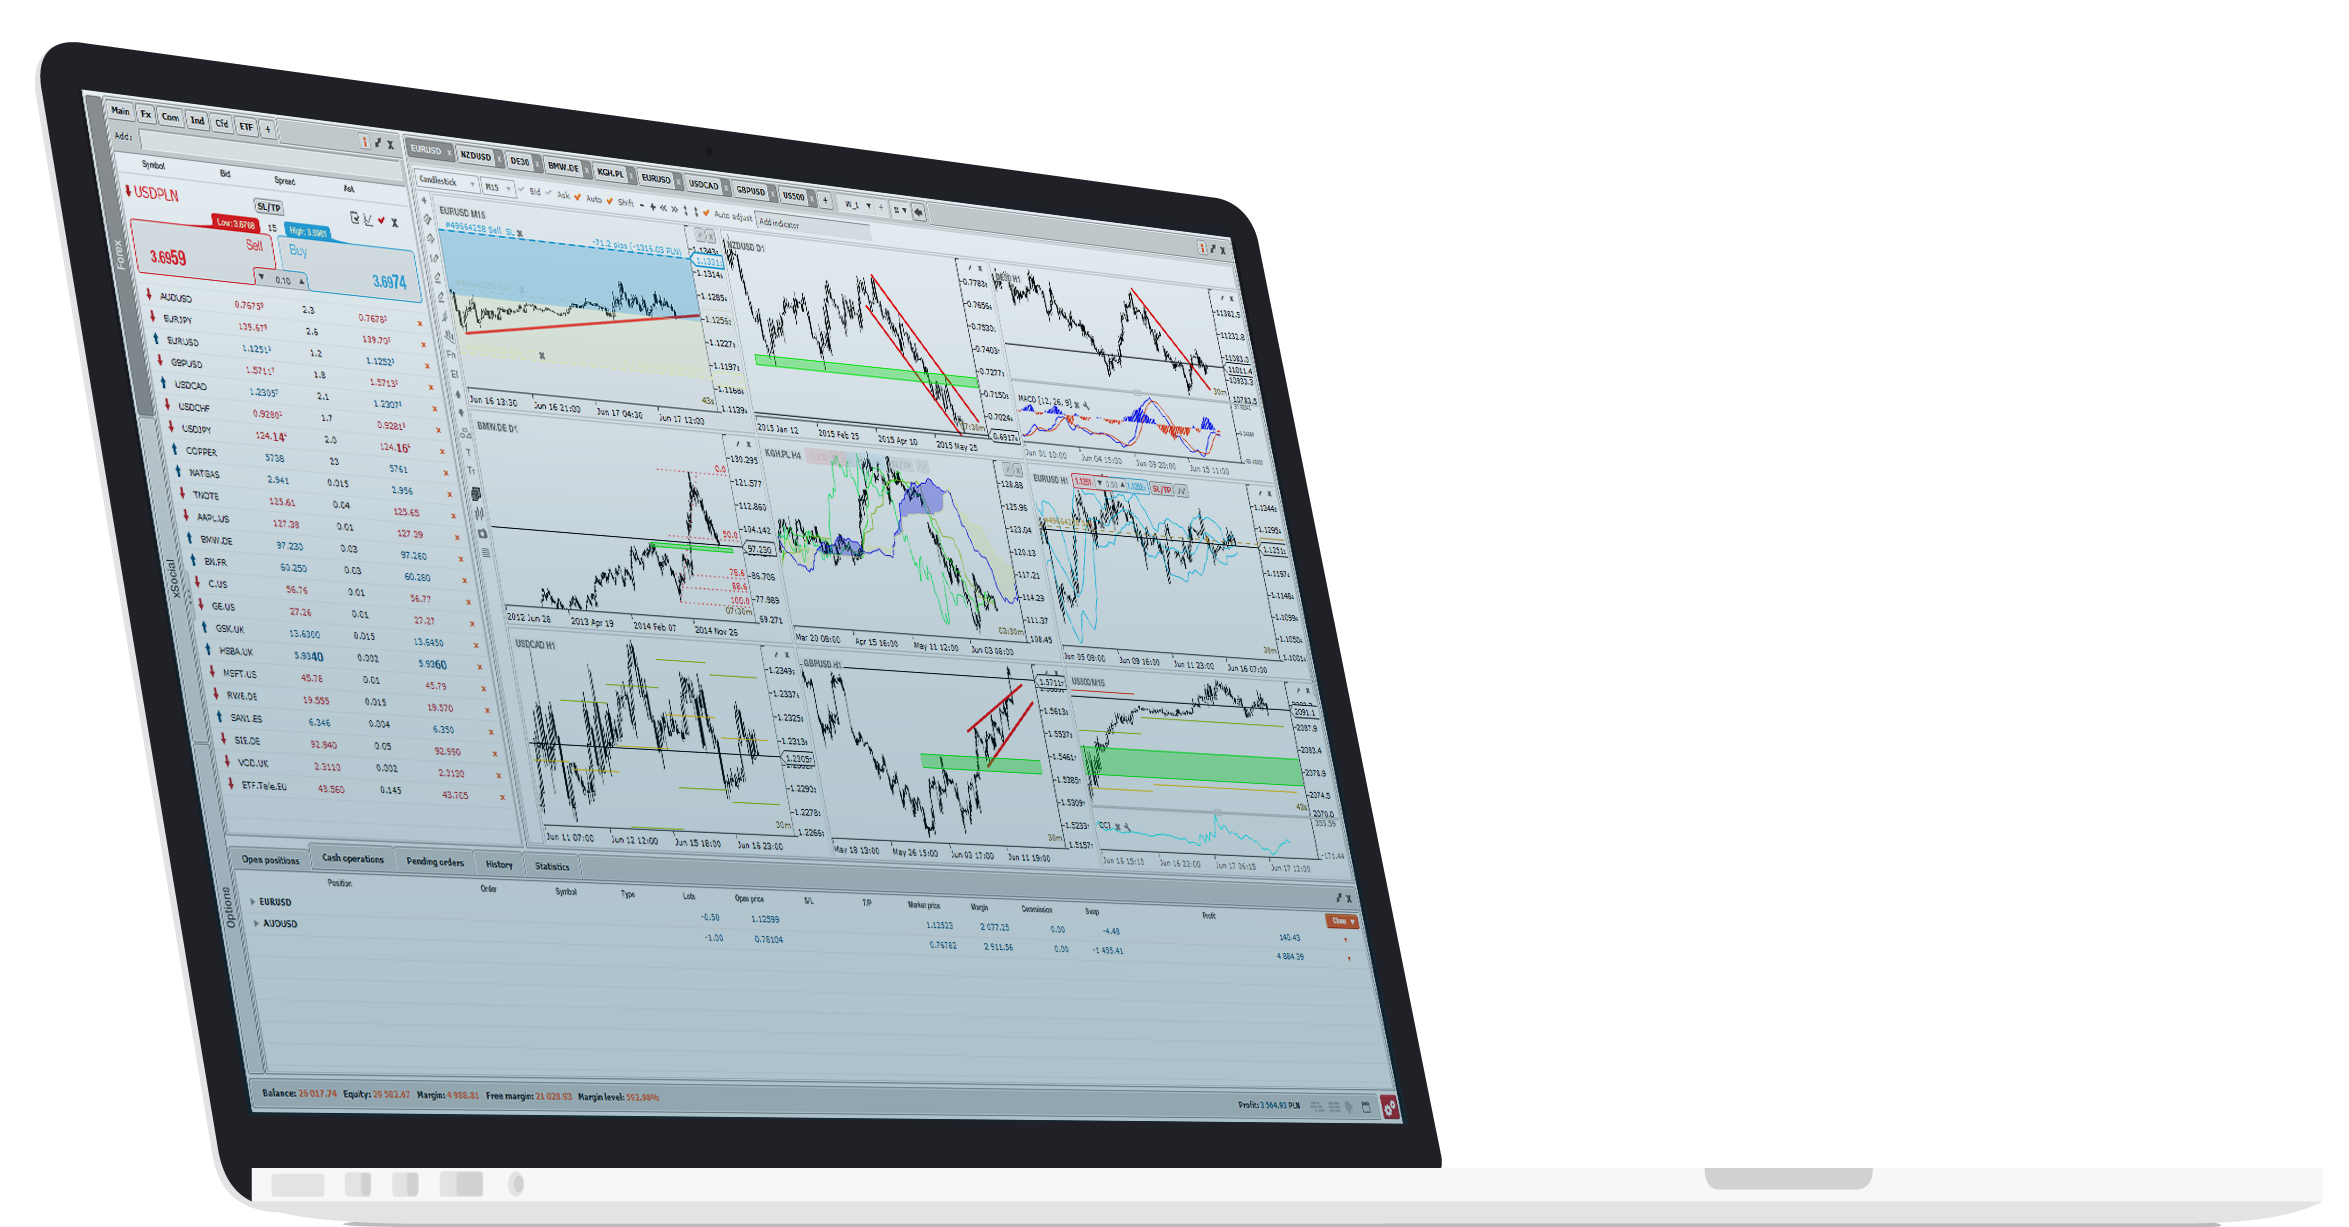 Xtb option trader demo